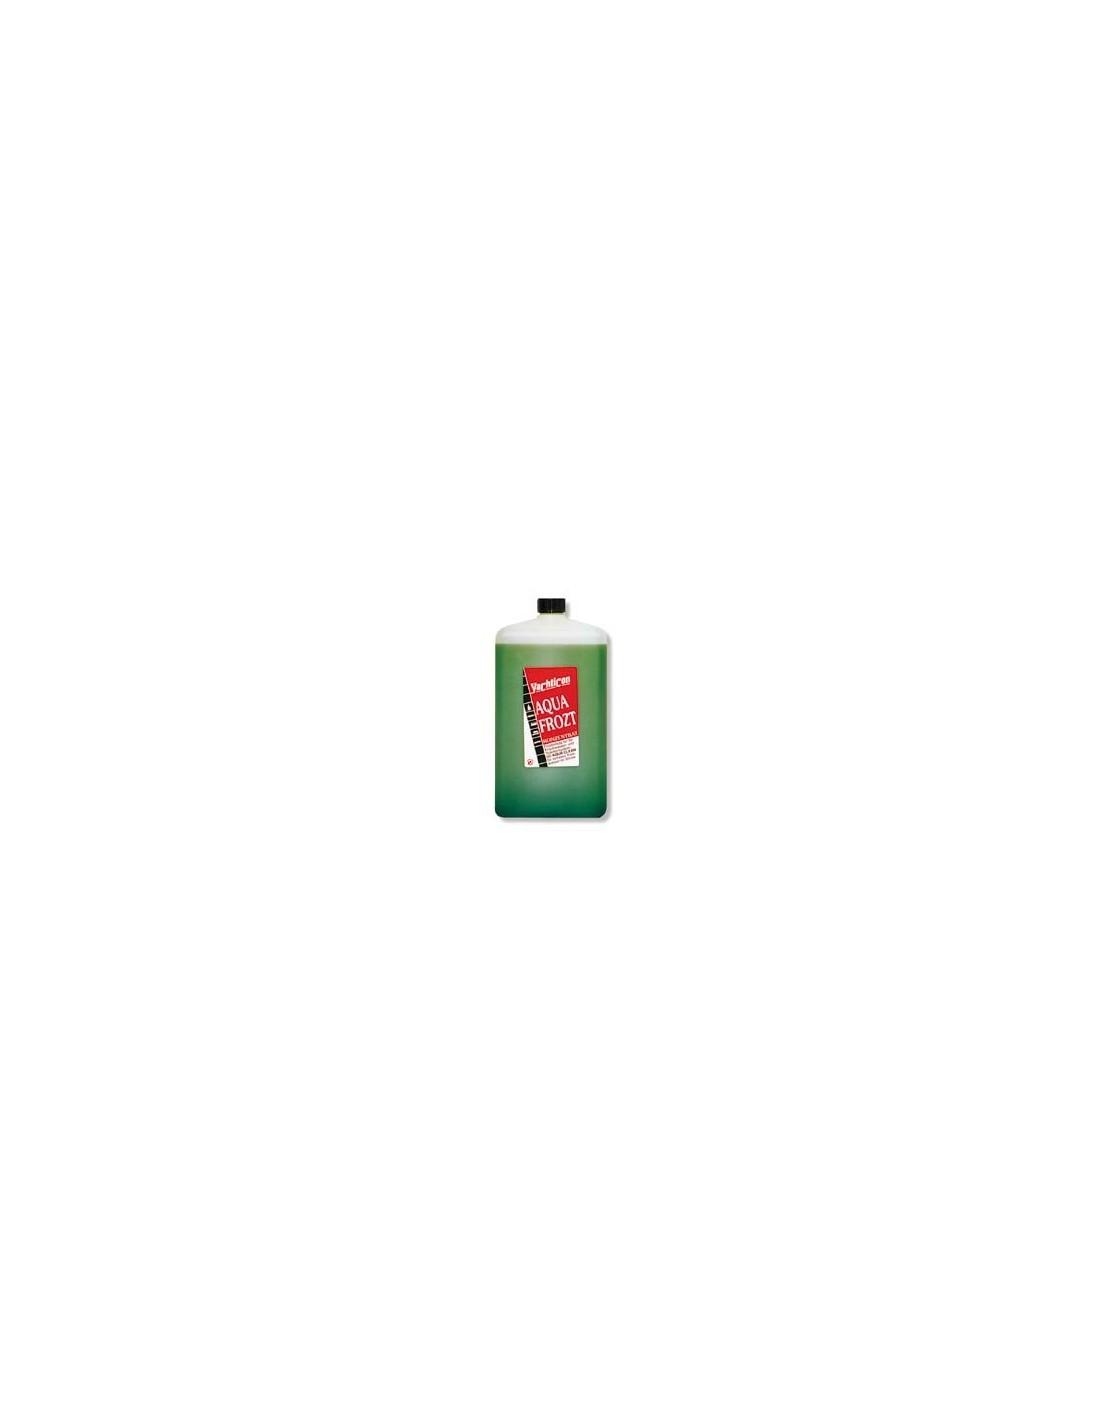 Aqua Frozt - Antivries - Concentraat - 2 Liter